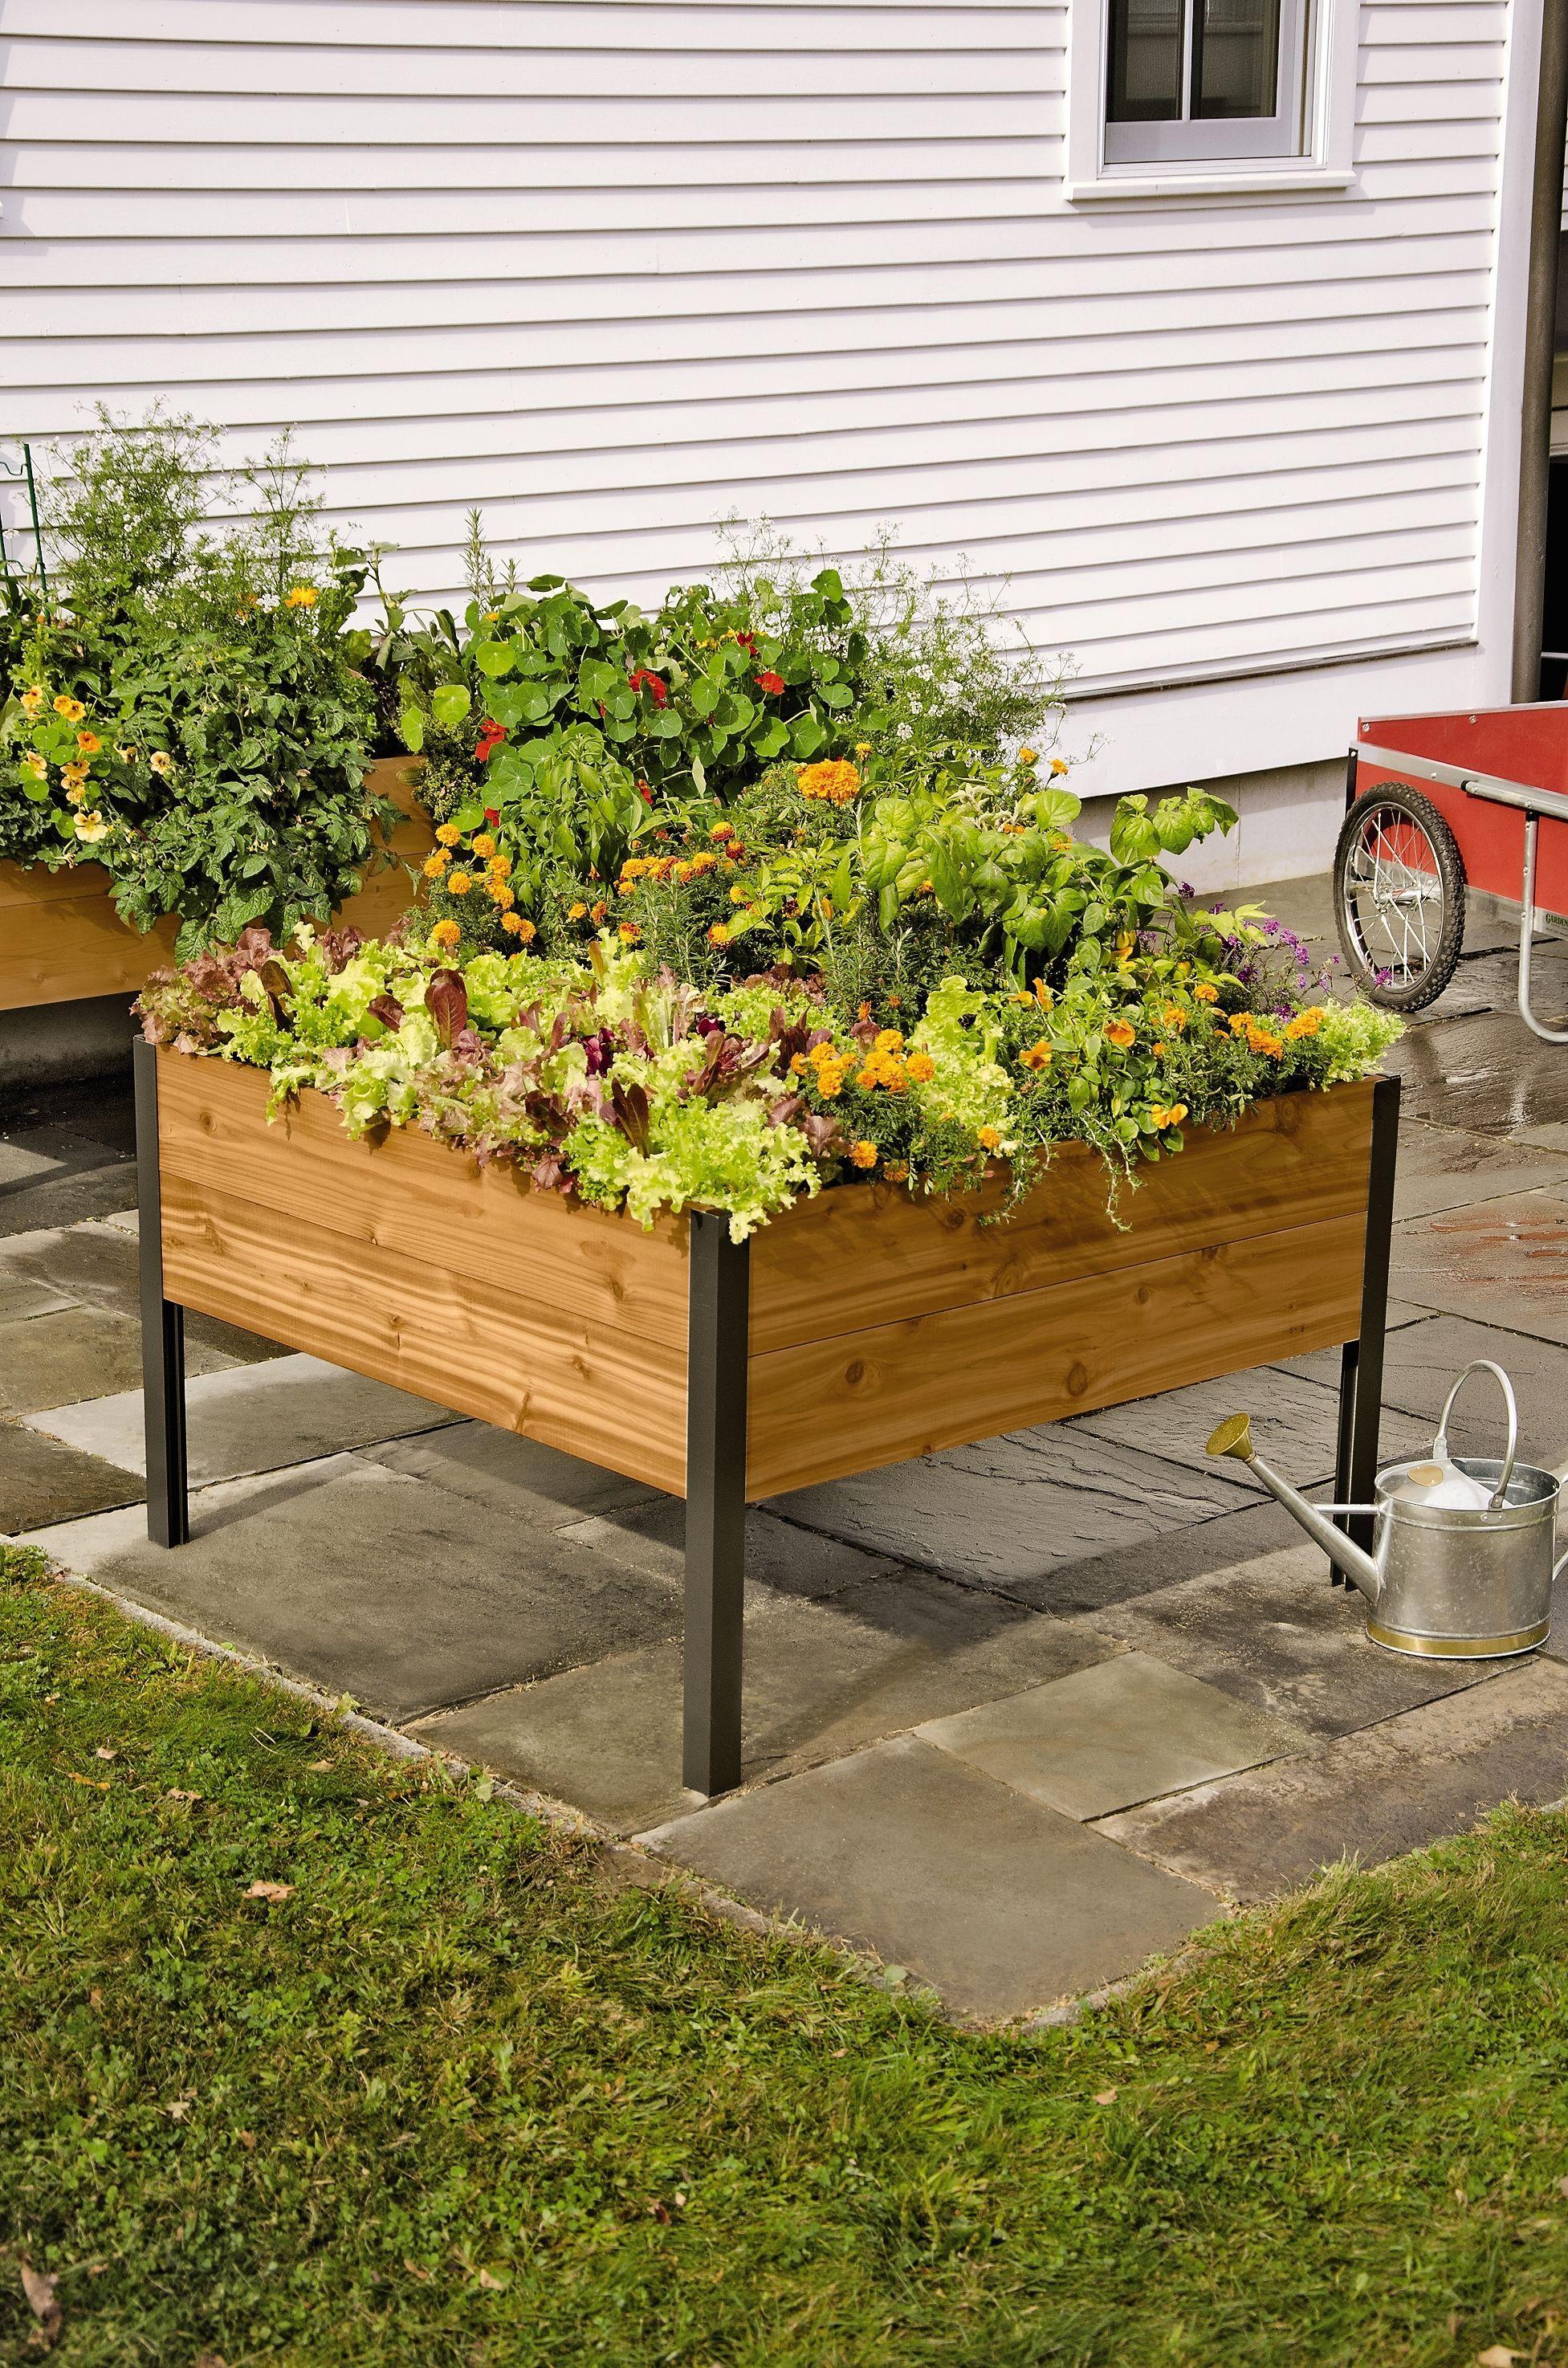 4 39 X 4 39 Elevated Cedar Planter Box Gardener 39 S Supply Company Raised Garden Beds Pinterest